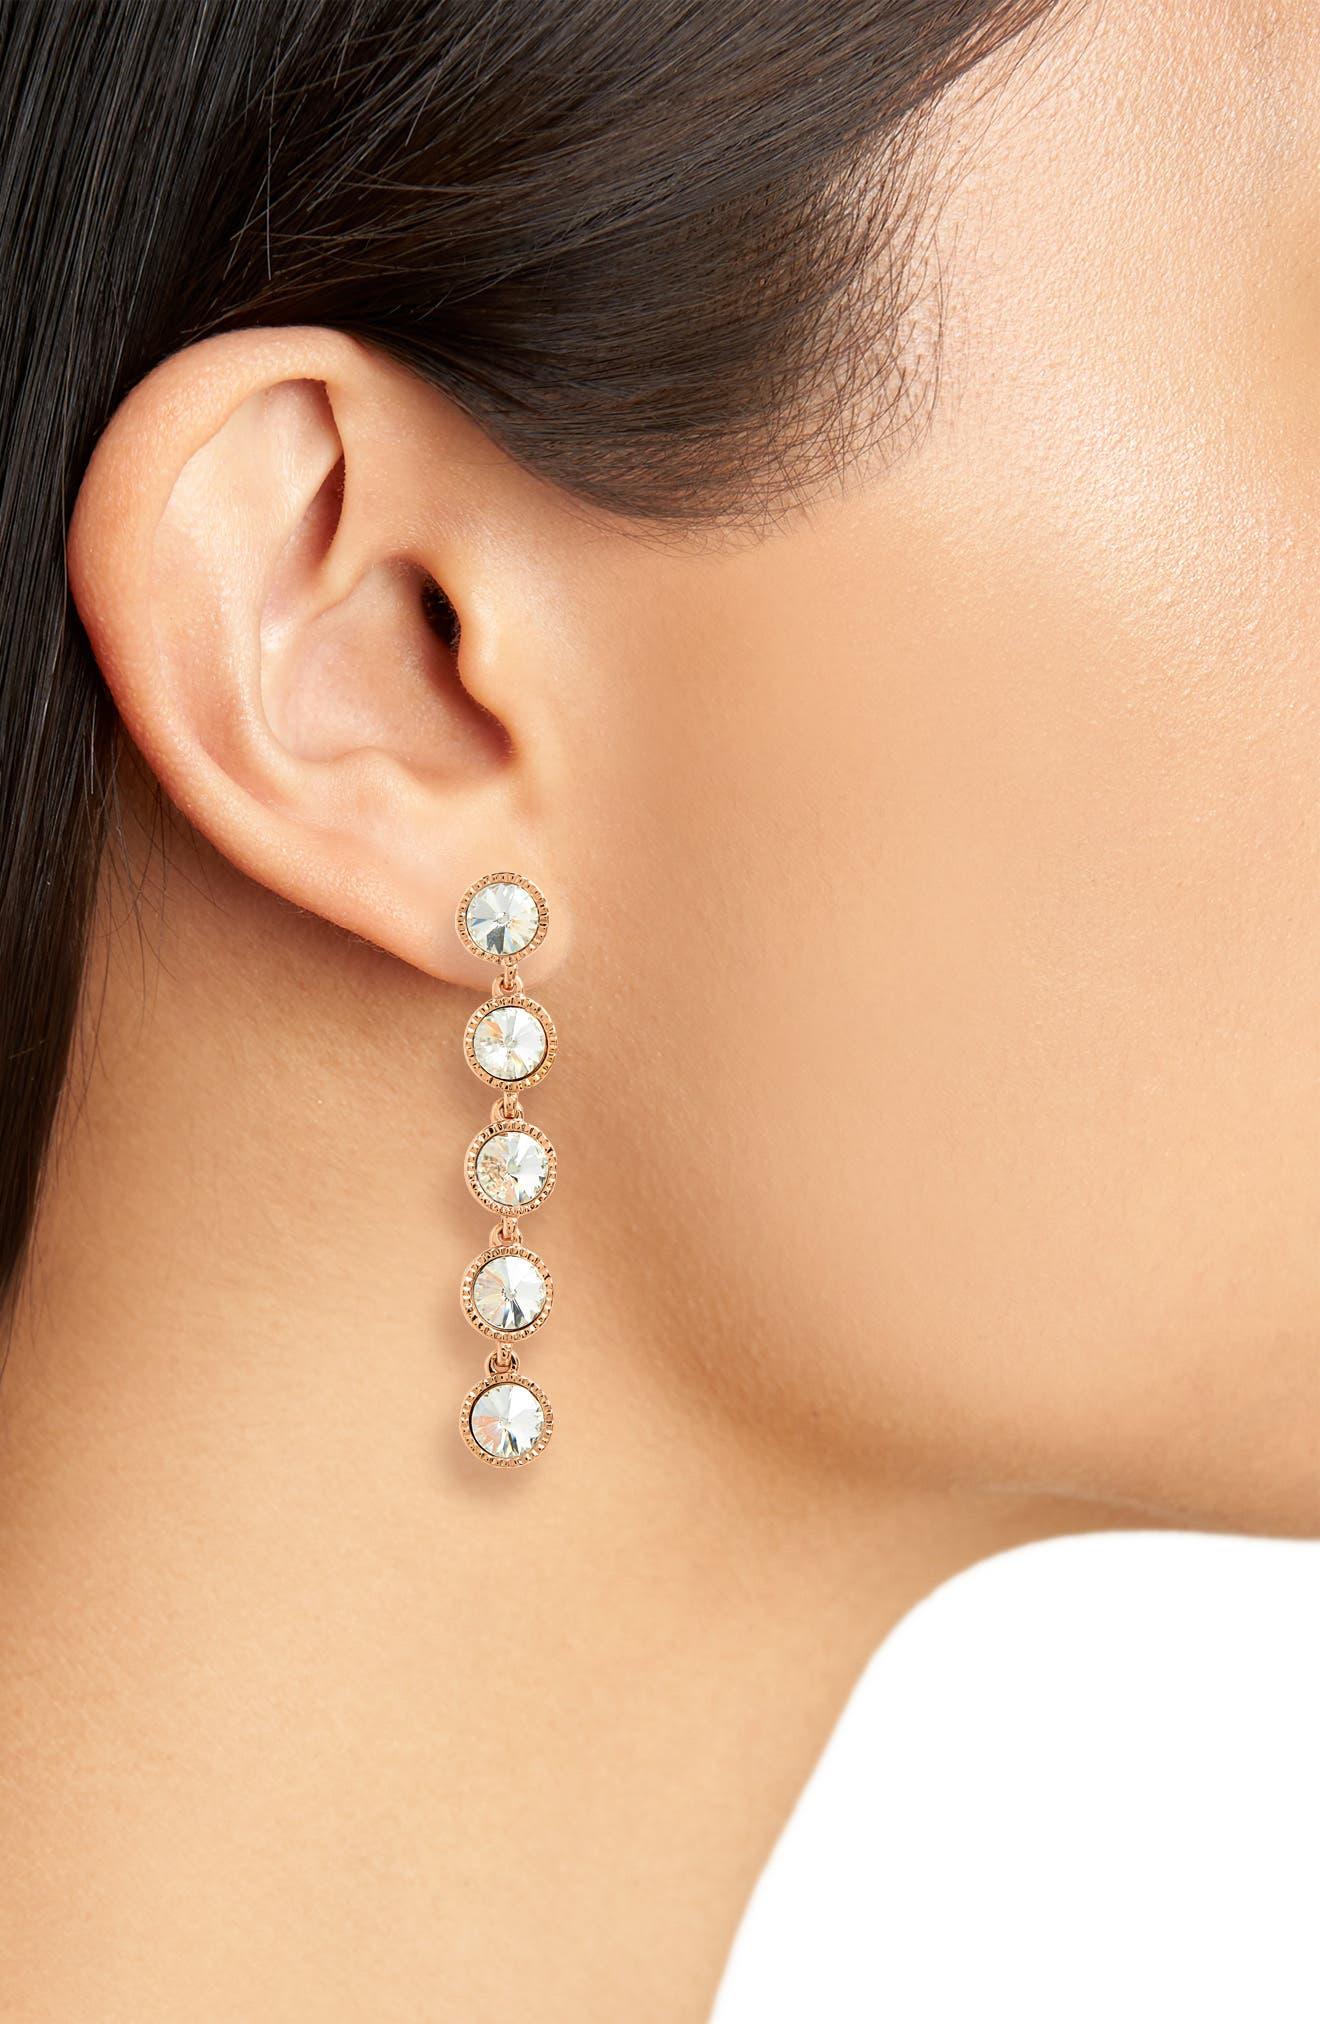 Rizza Crystal Drop Earrings,                             Alternate thumbnail 2, color,                             044